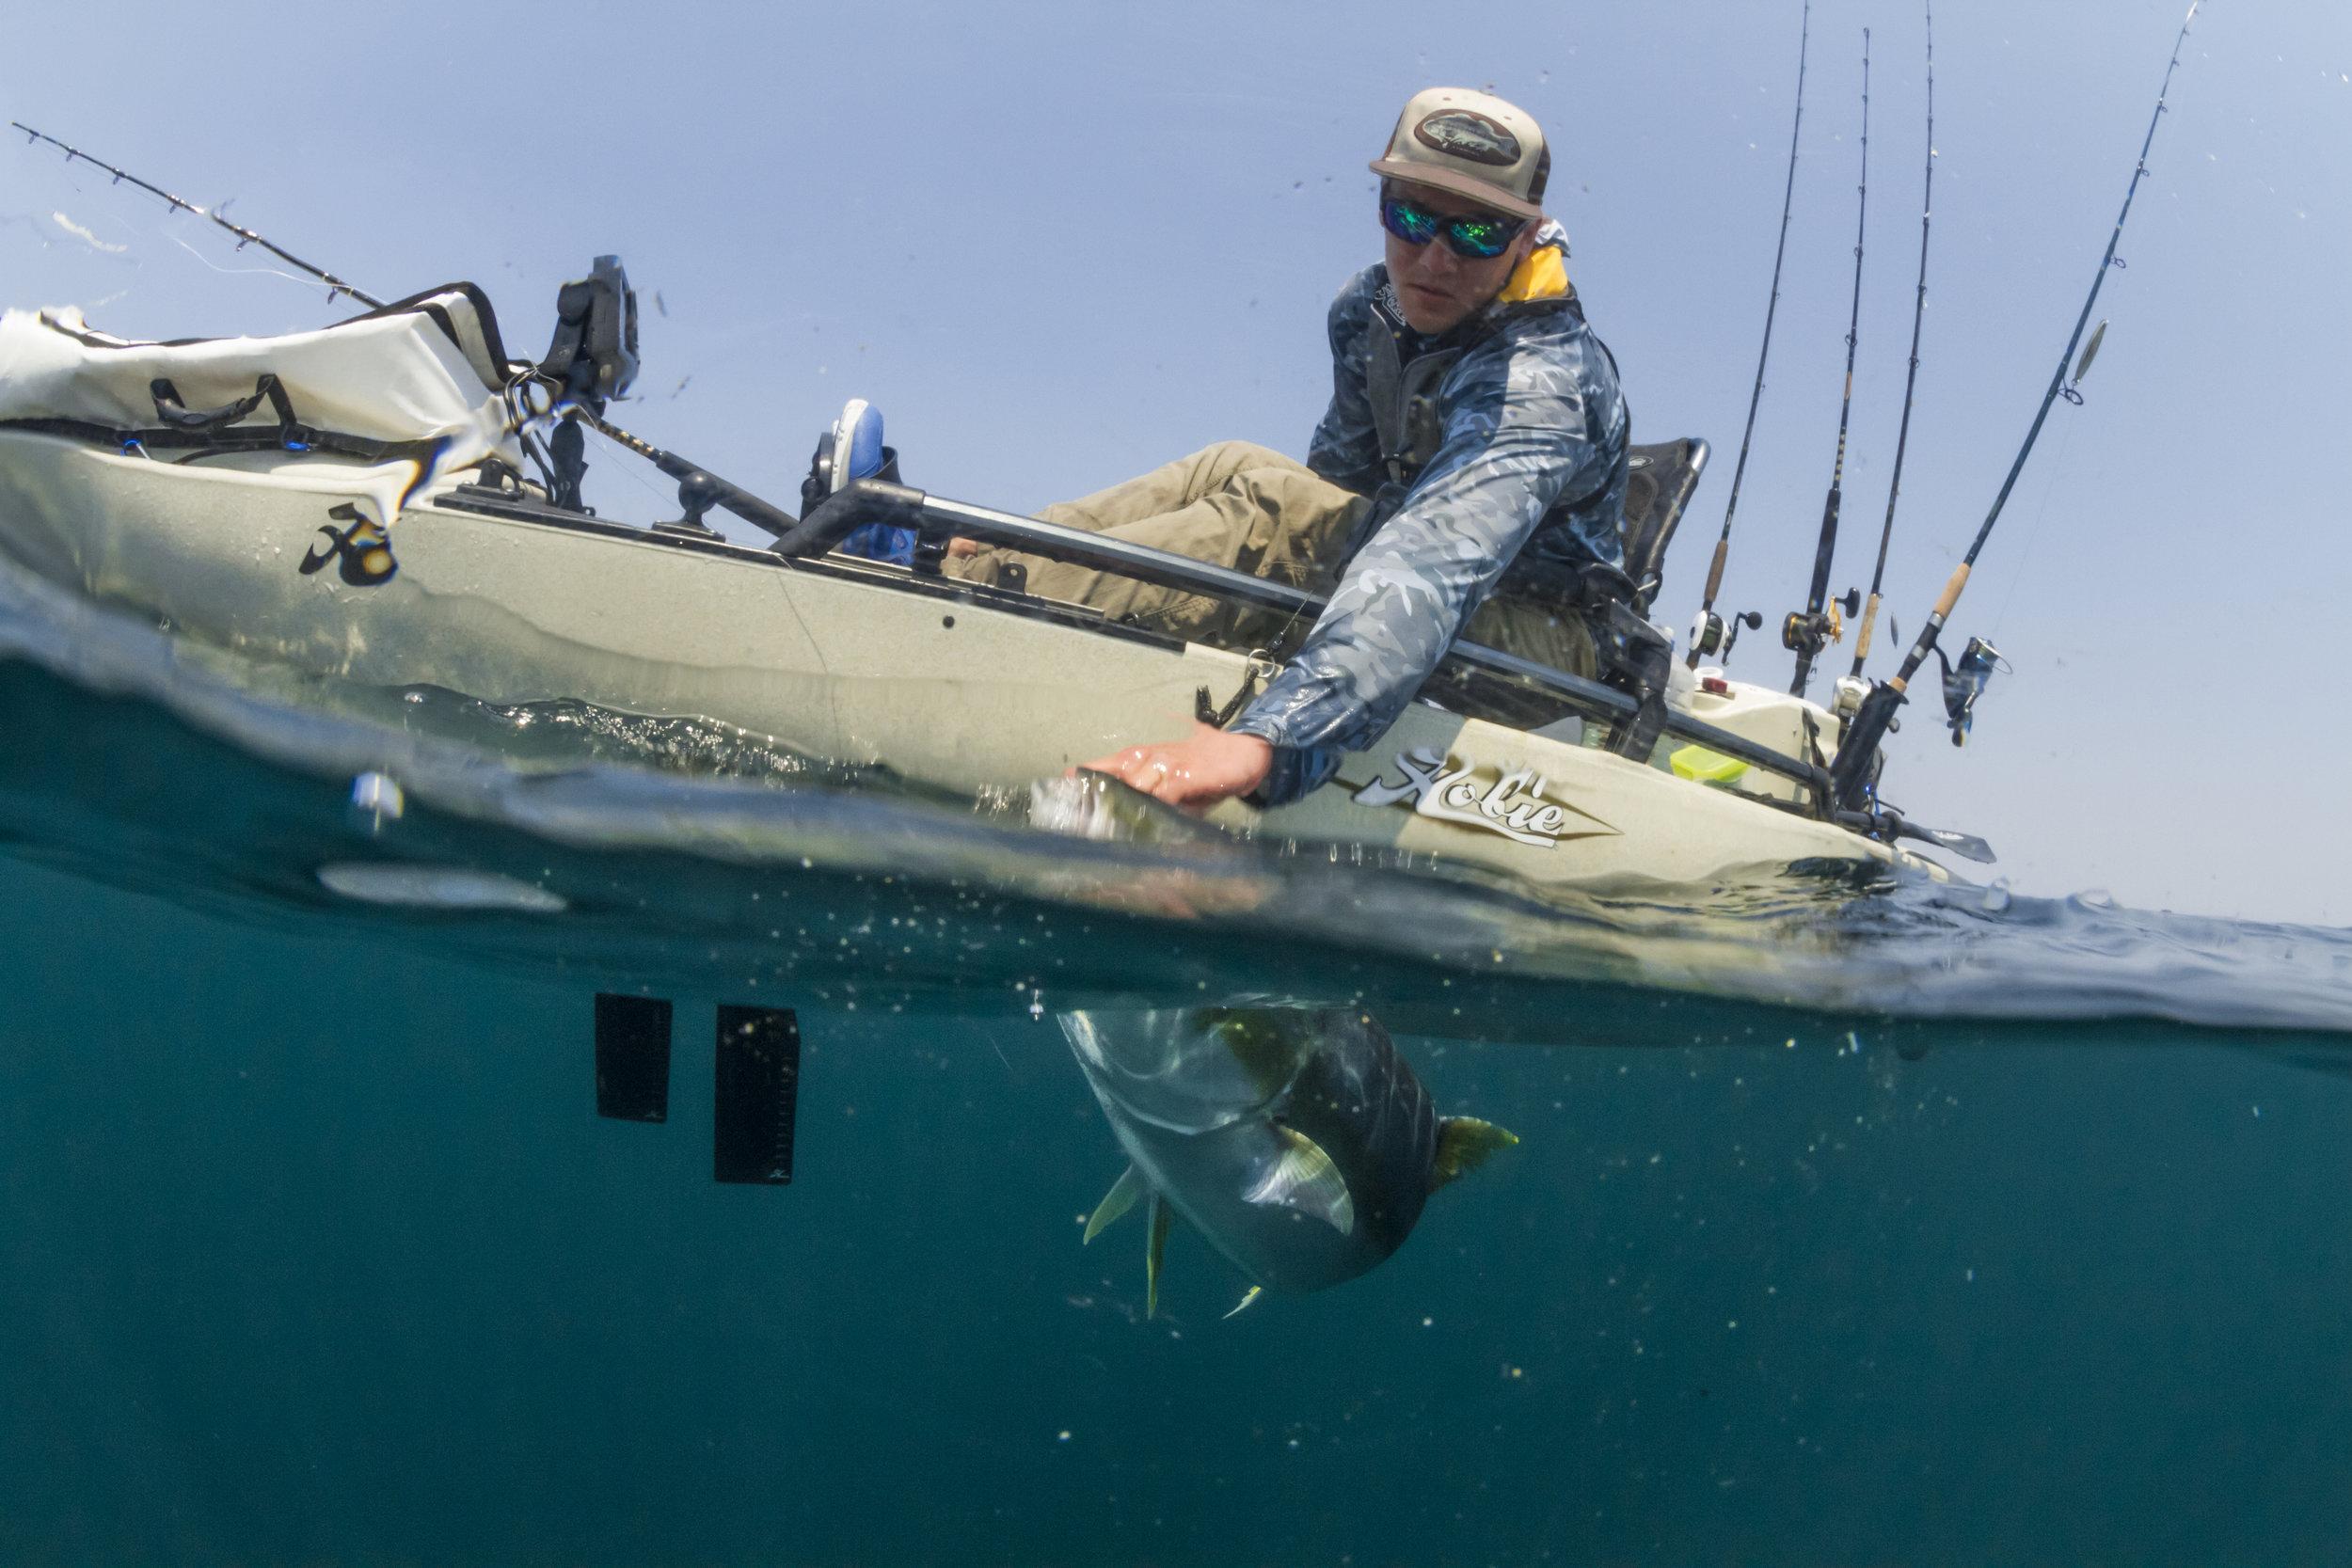 ProAngler14-action-fishing-overUnder-MD180-yellowtail-4371-full.jpg